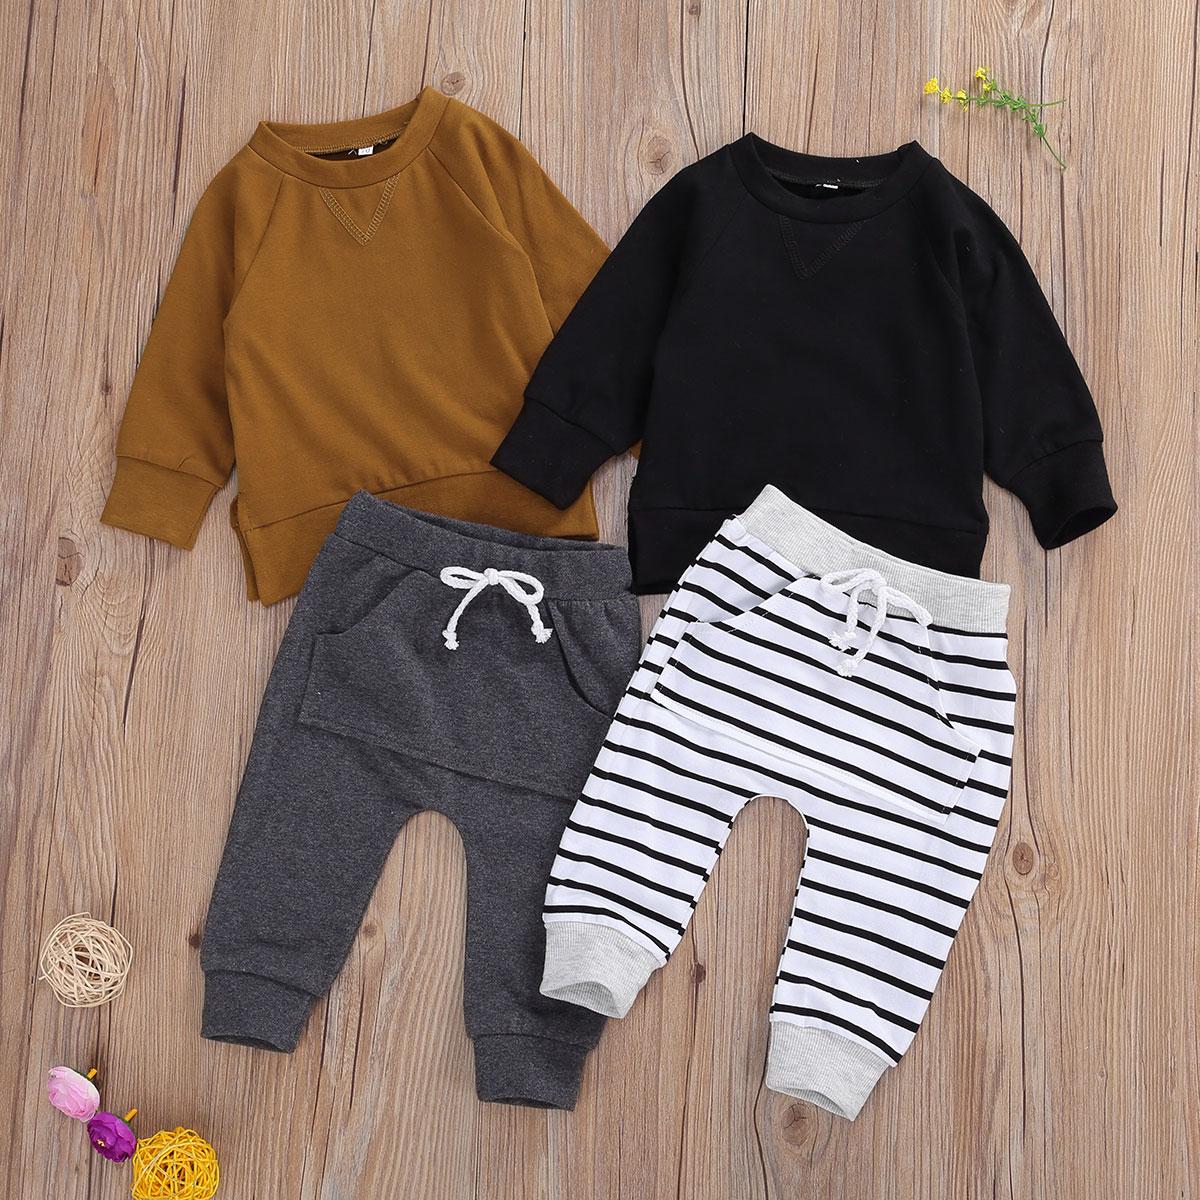 Conjuntos de ropa para bebés de 0 a 24 meses, jersey de manga larga, sudadera, pantalones lisos/a rayas, Pantalones